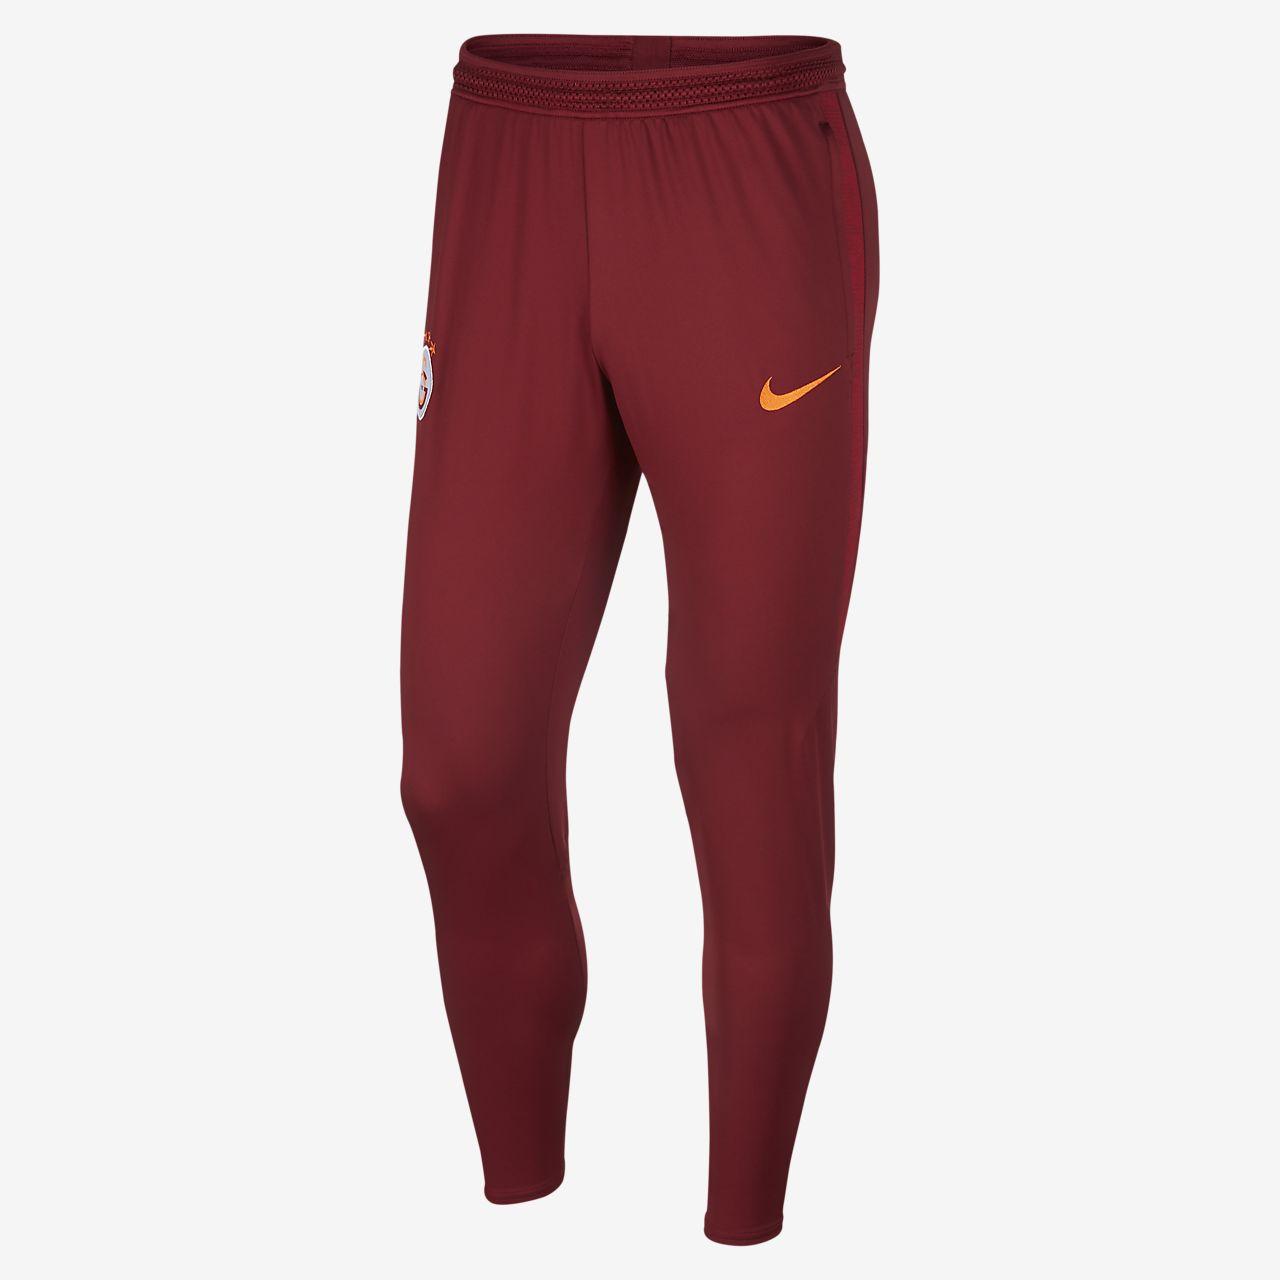 Nike Dri-FIT Galatasaray Herren-Fußballhose